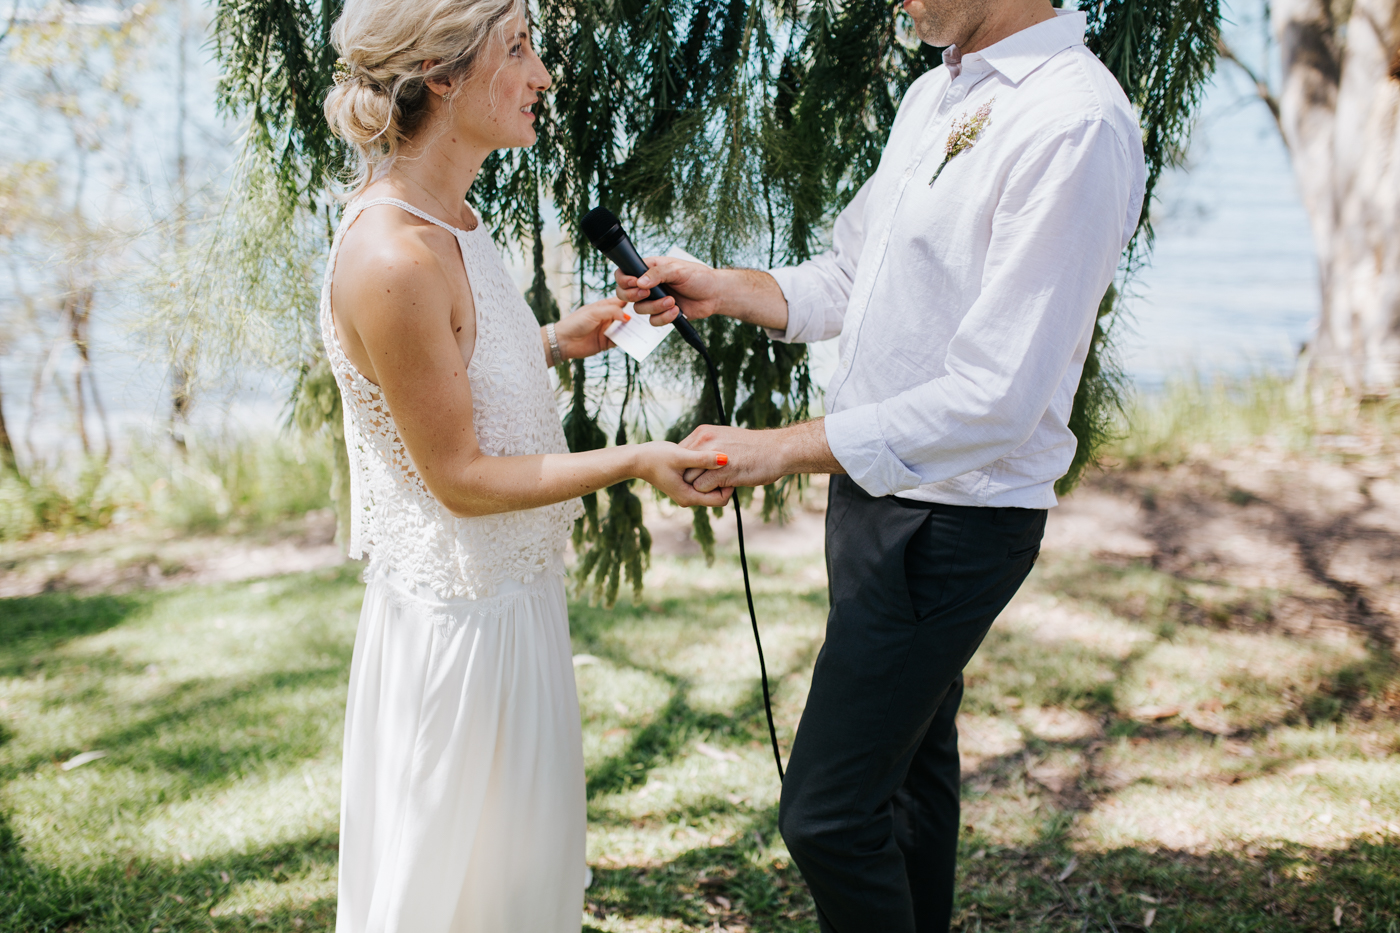 Emma & Ben - Lake Macquarie - Hunter Valley Wedding - Samantha Heather Photography-114.jpg